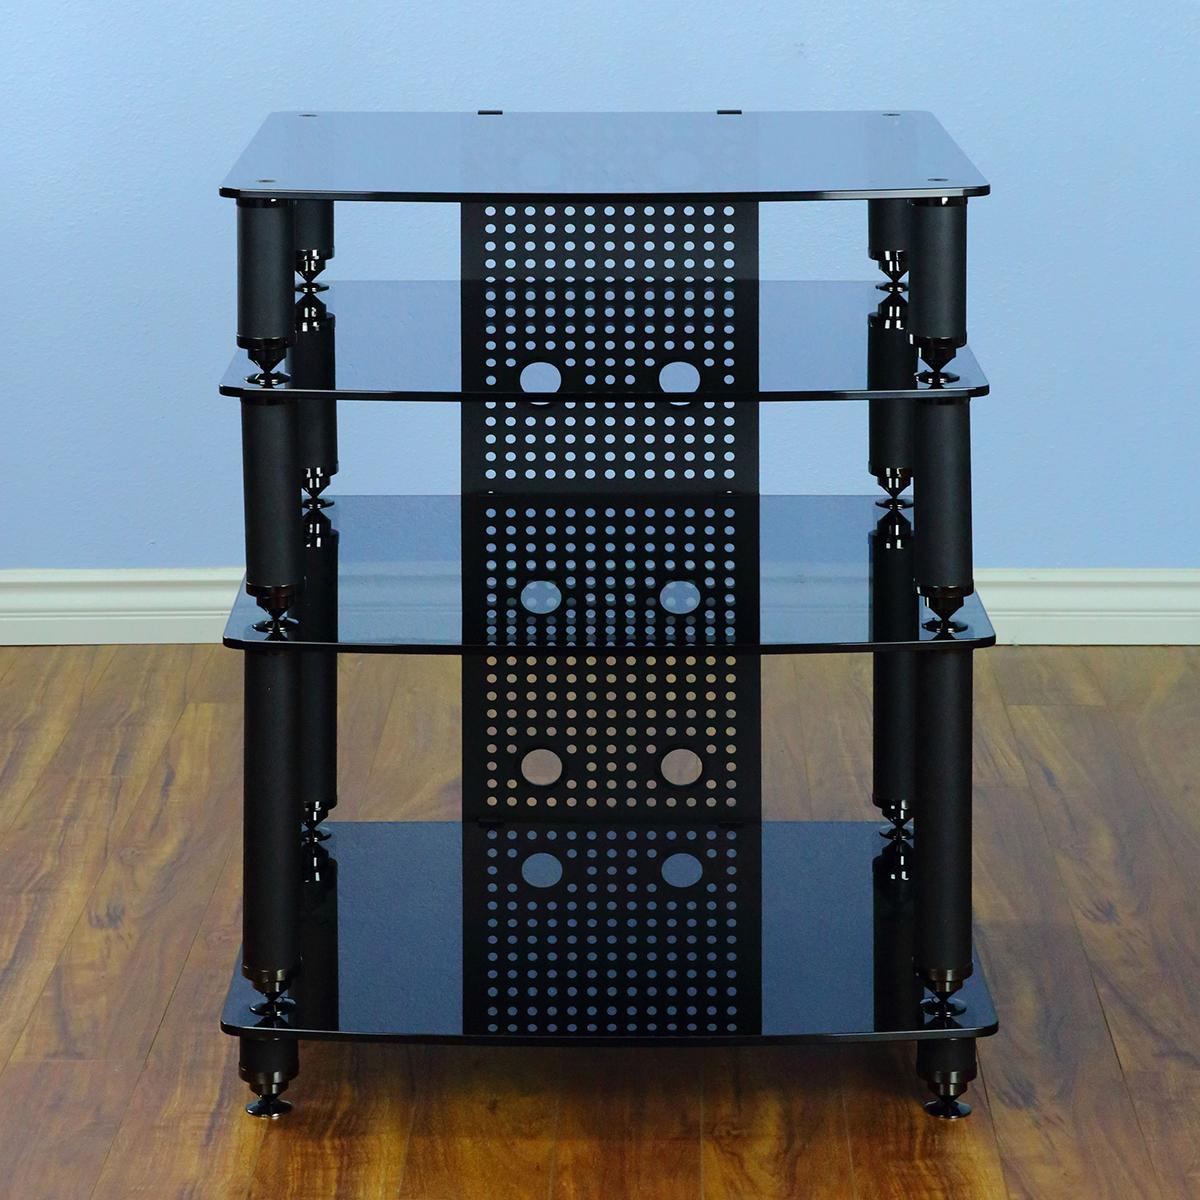 Vti 36444 36000 Series Professional Audio Rack In Black W